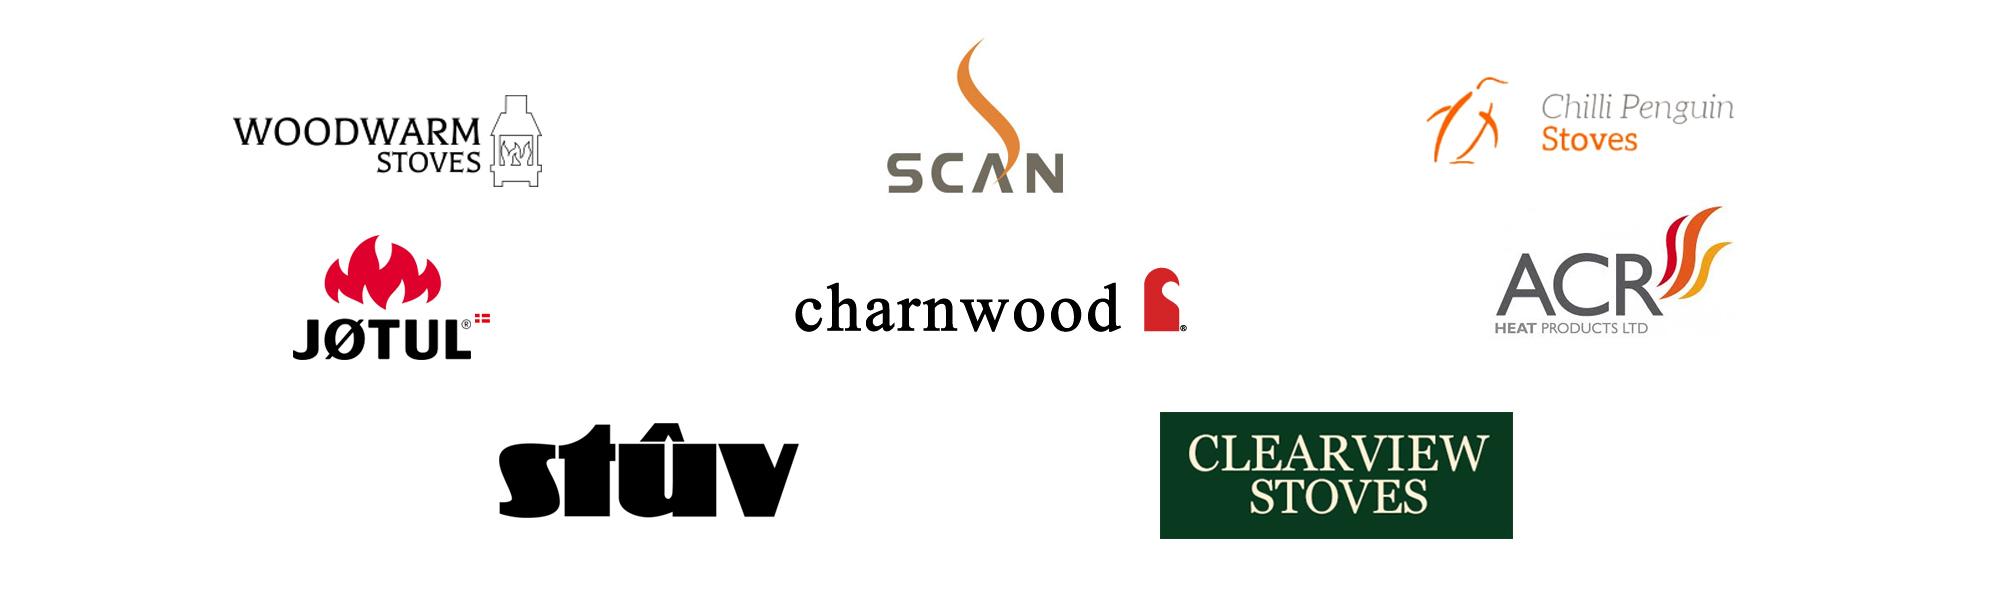 Stove manufacturers